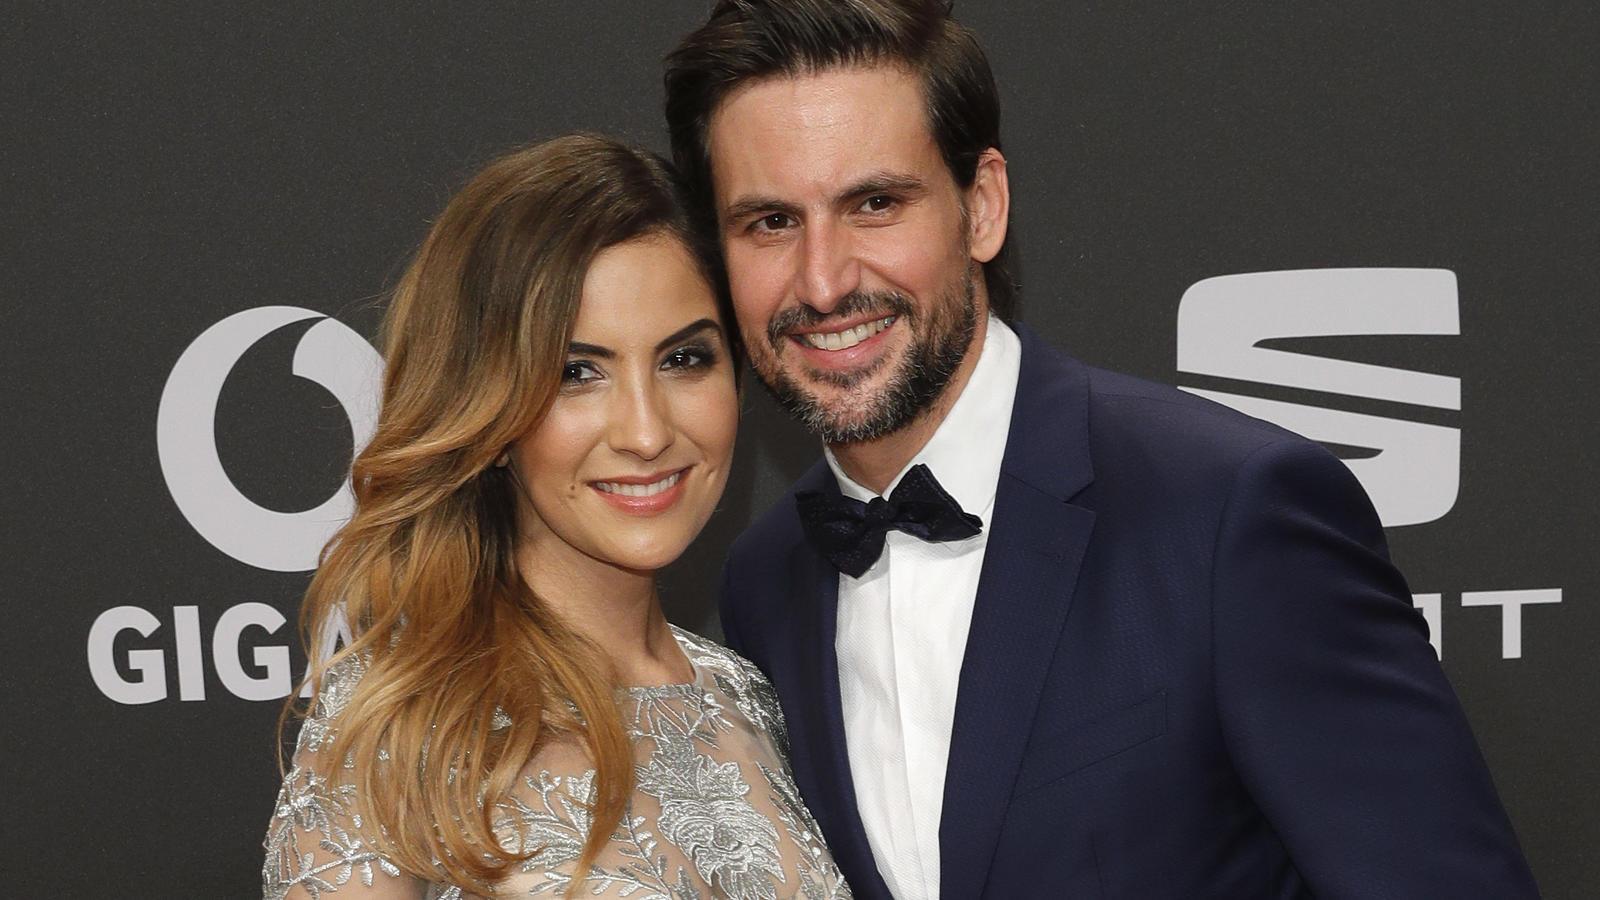 Verlobung! TV-Hottie Tom Beck heiratet GZSZ-Star Chryssanthi Kavazi